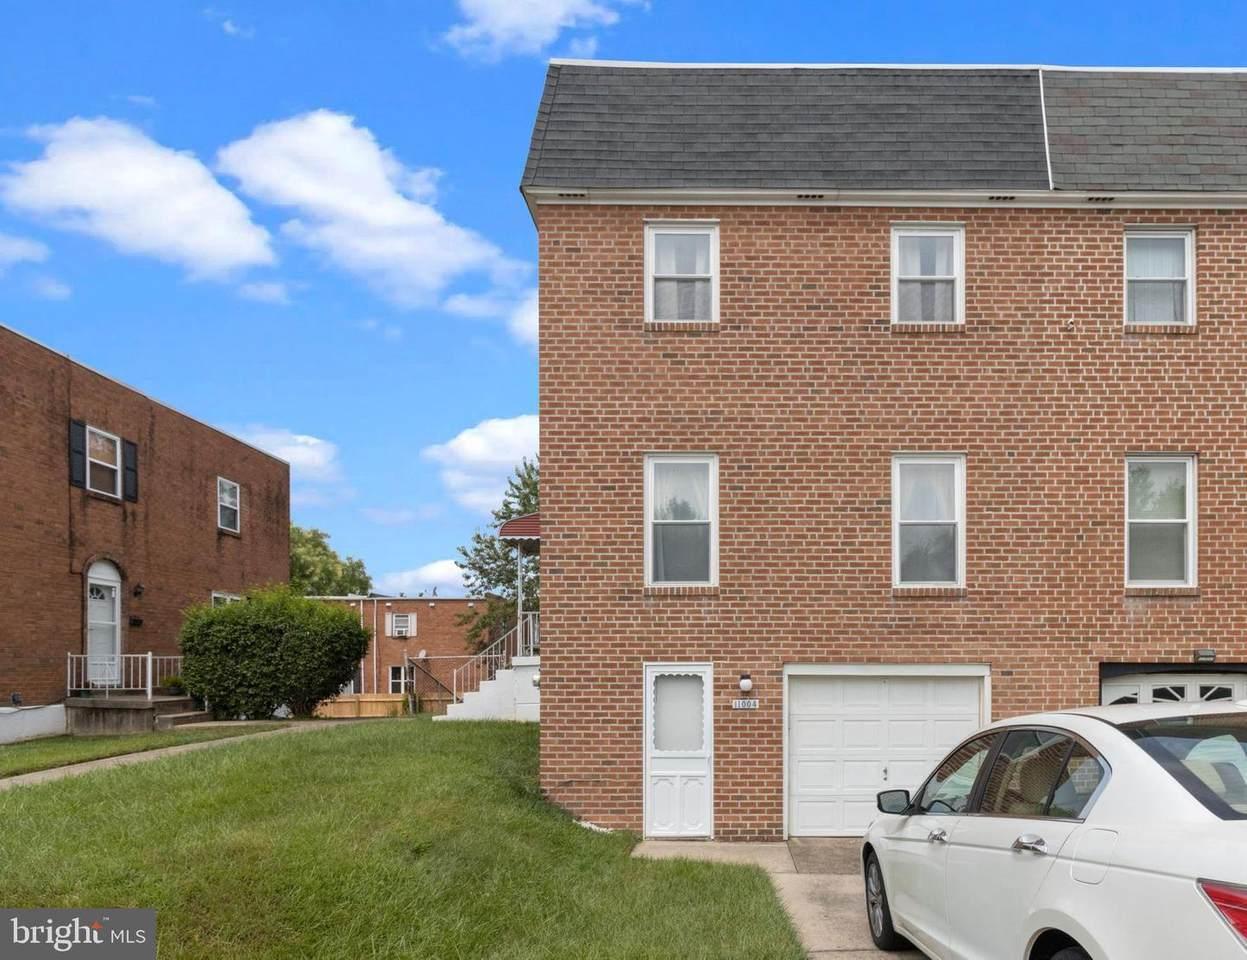 11004 Philmont Terrace - Photo 1